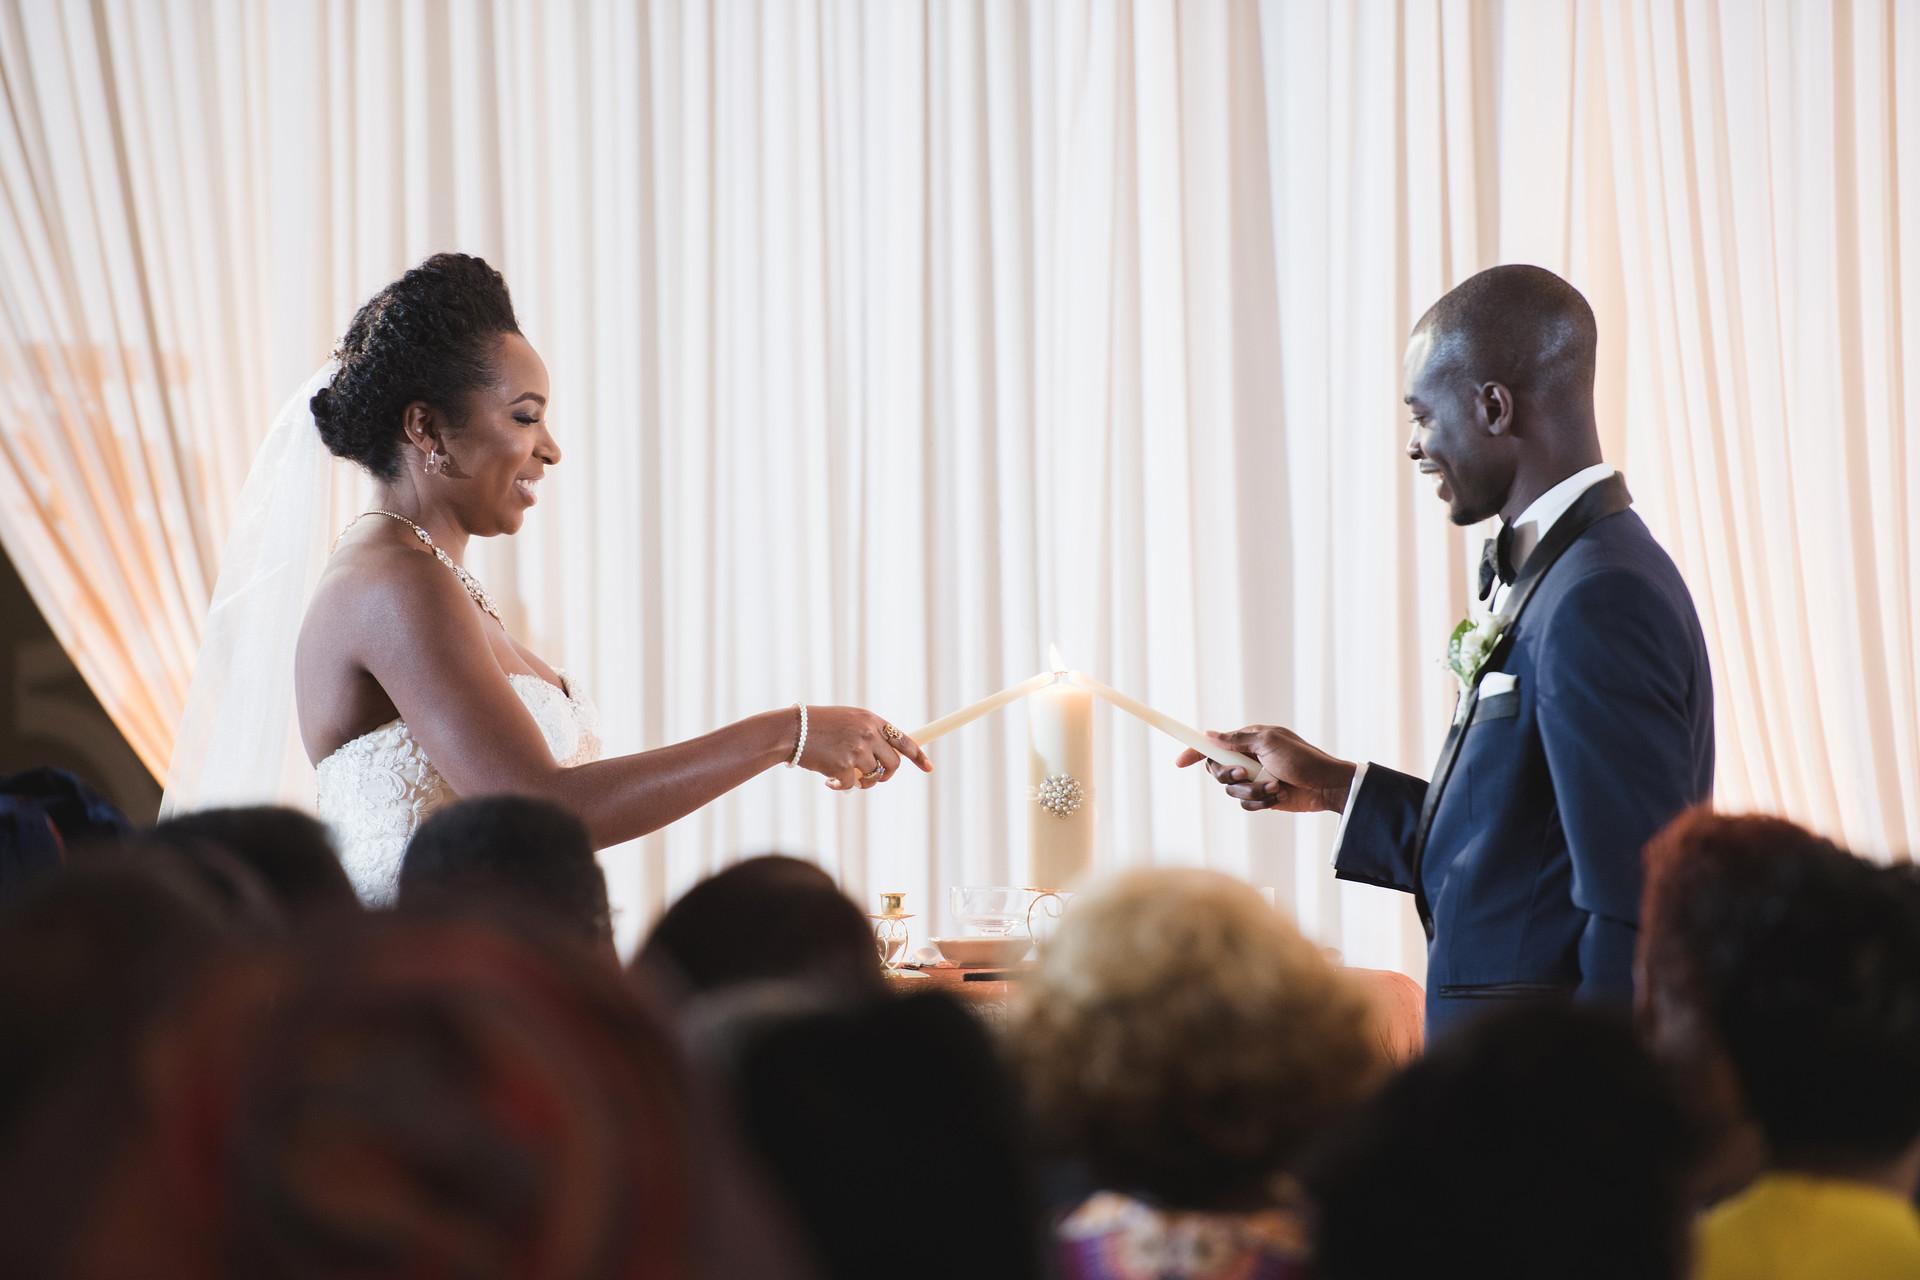 unity-candle-ceremony-black-love